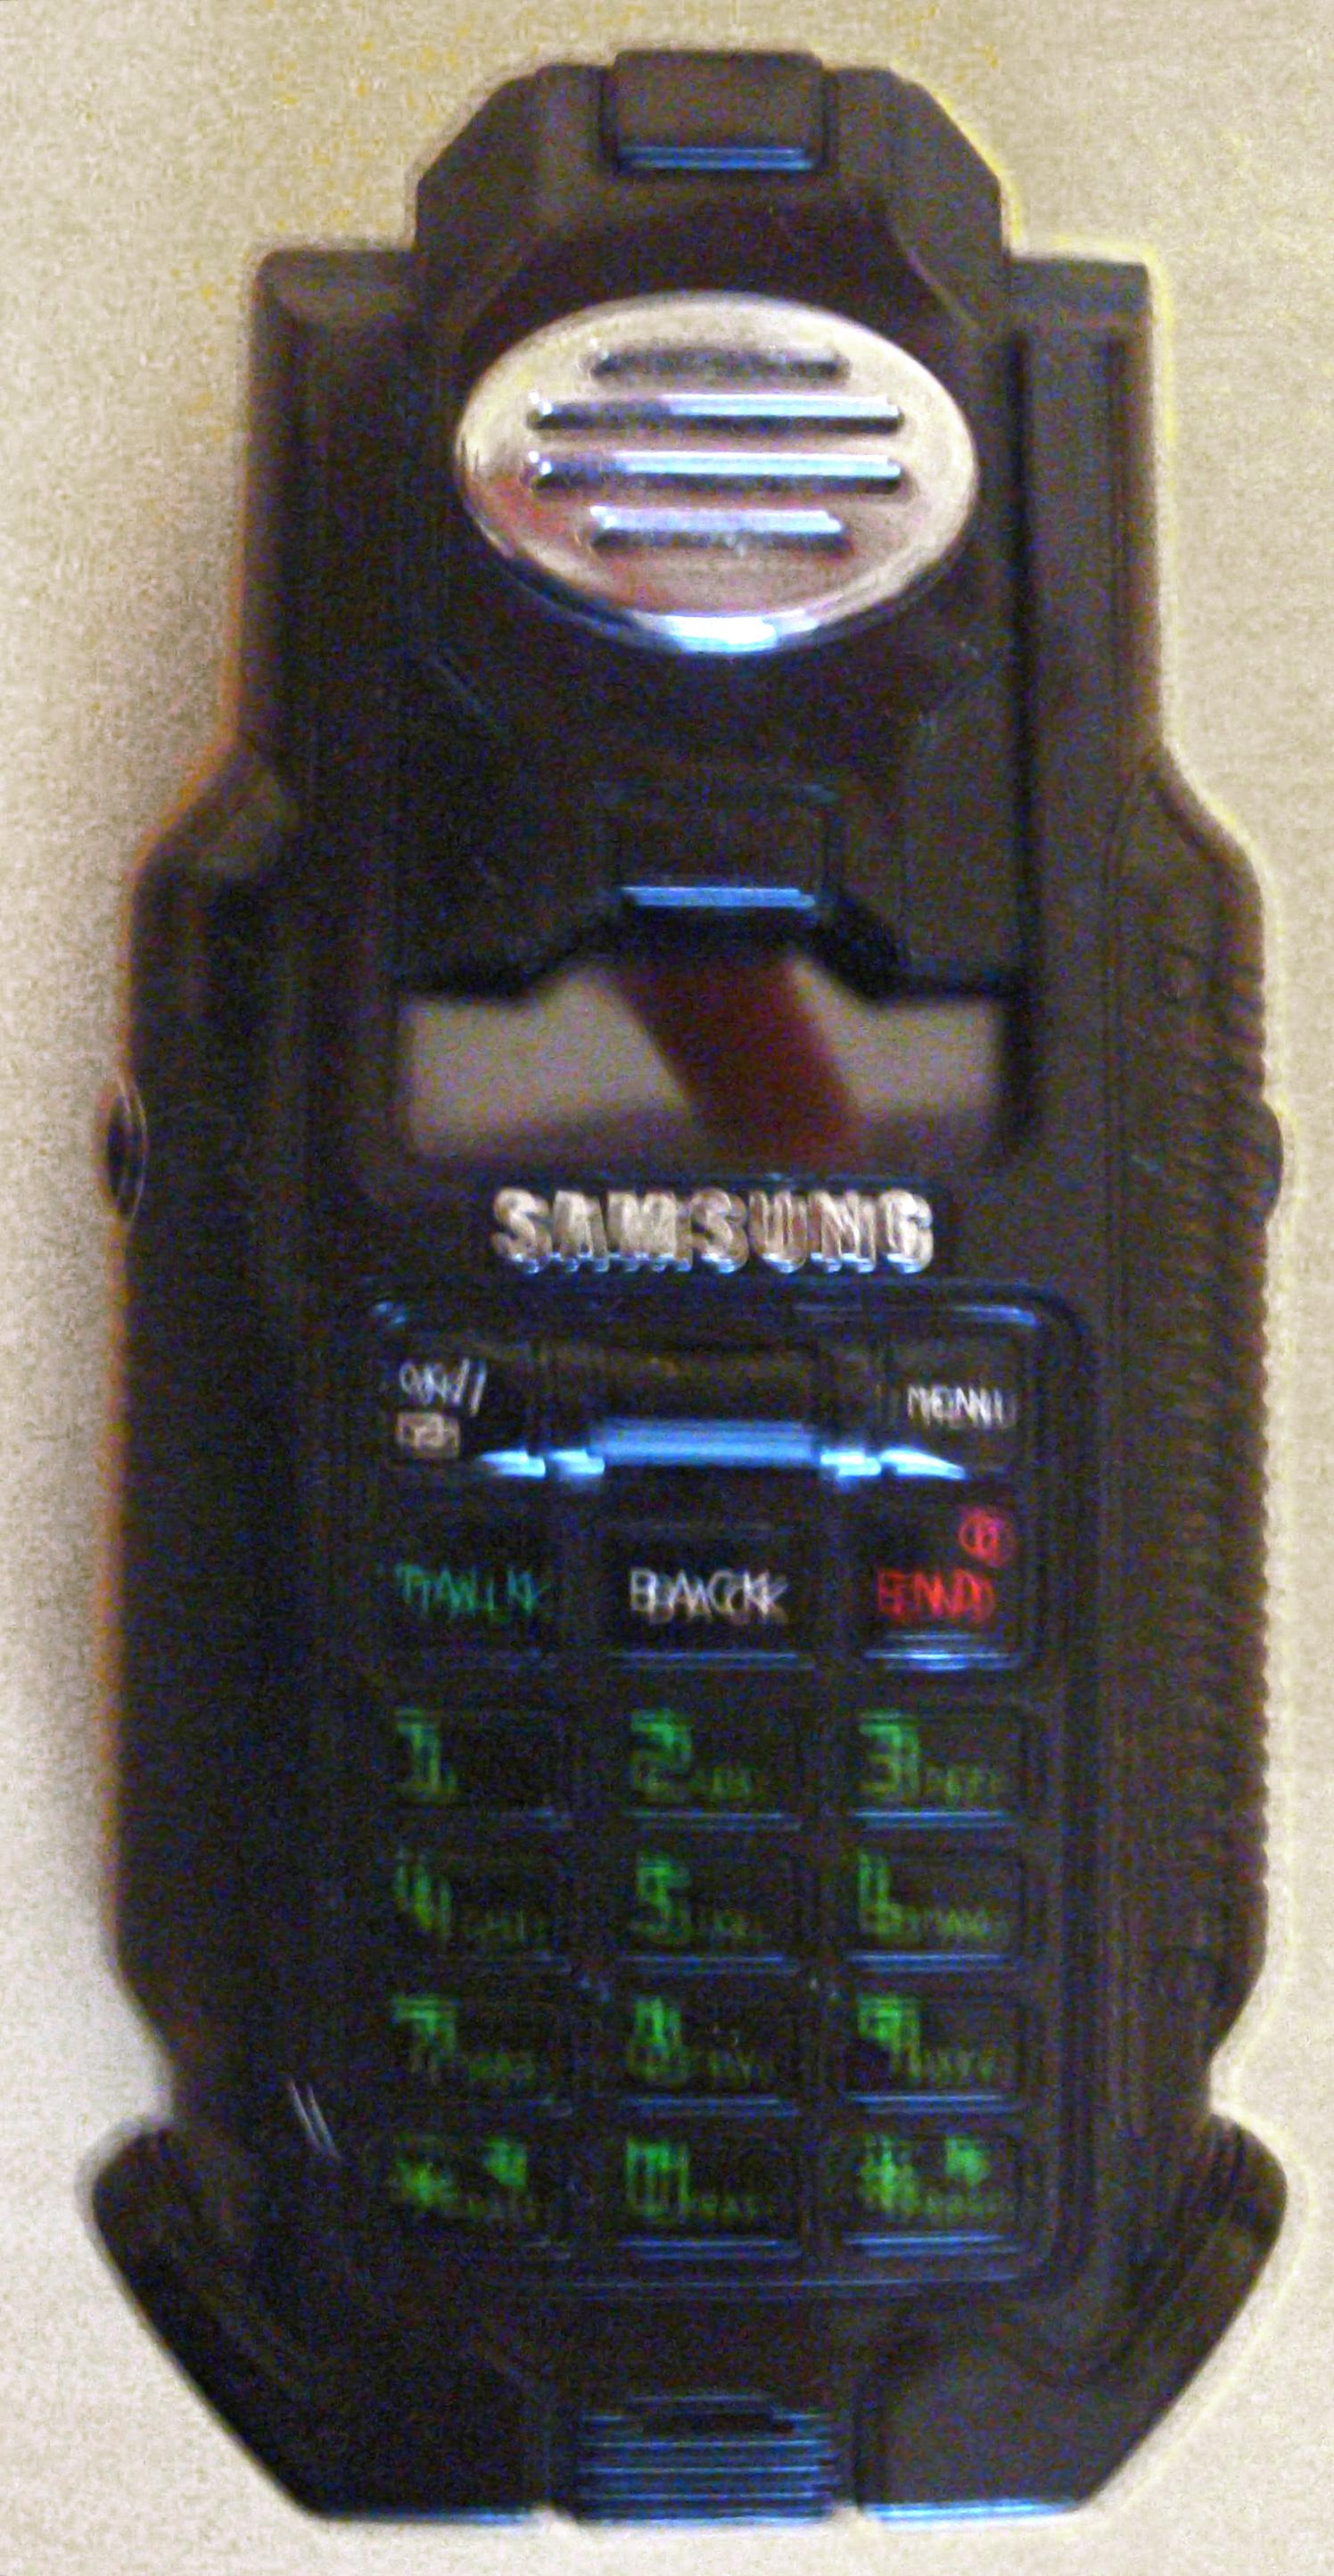 Samsung SPHN270  Wikipedia